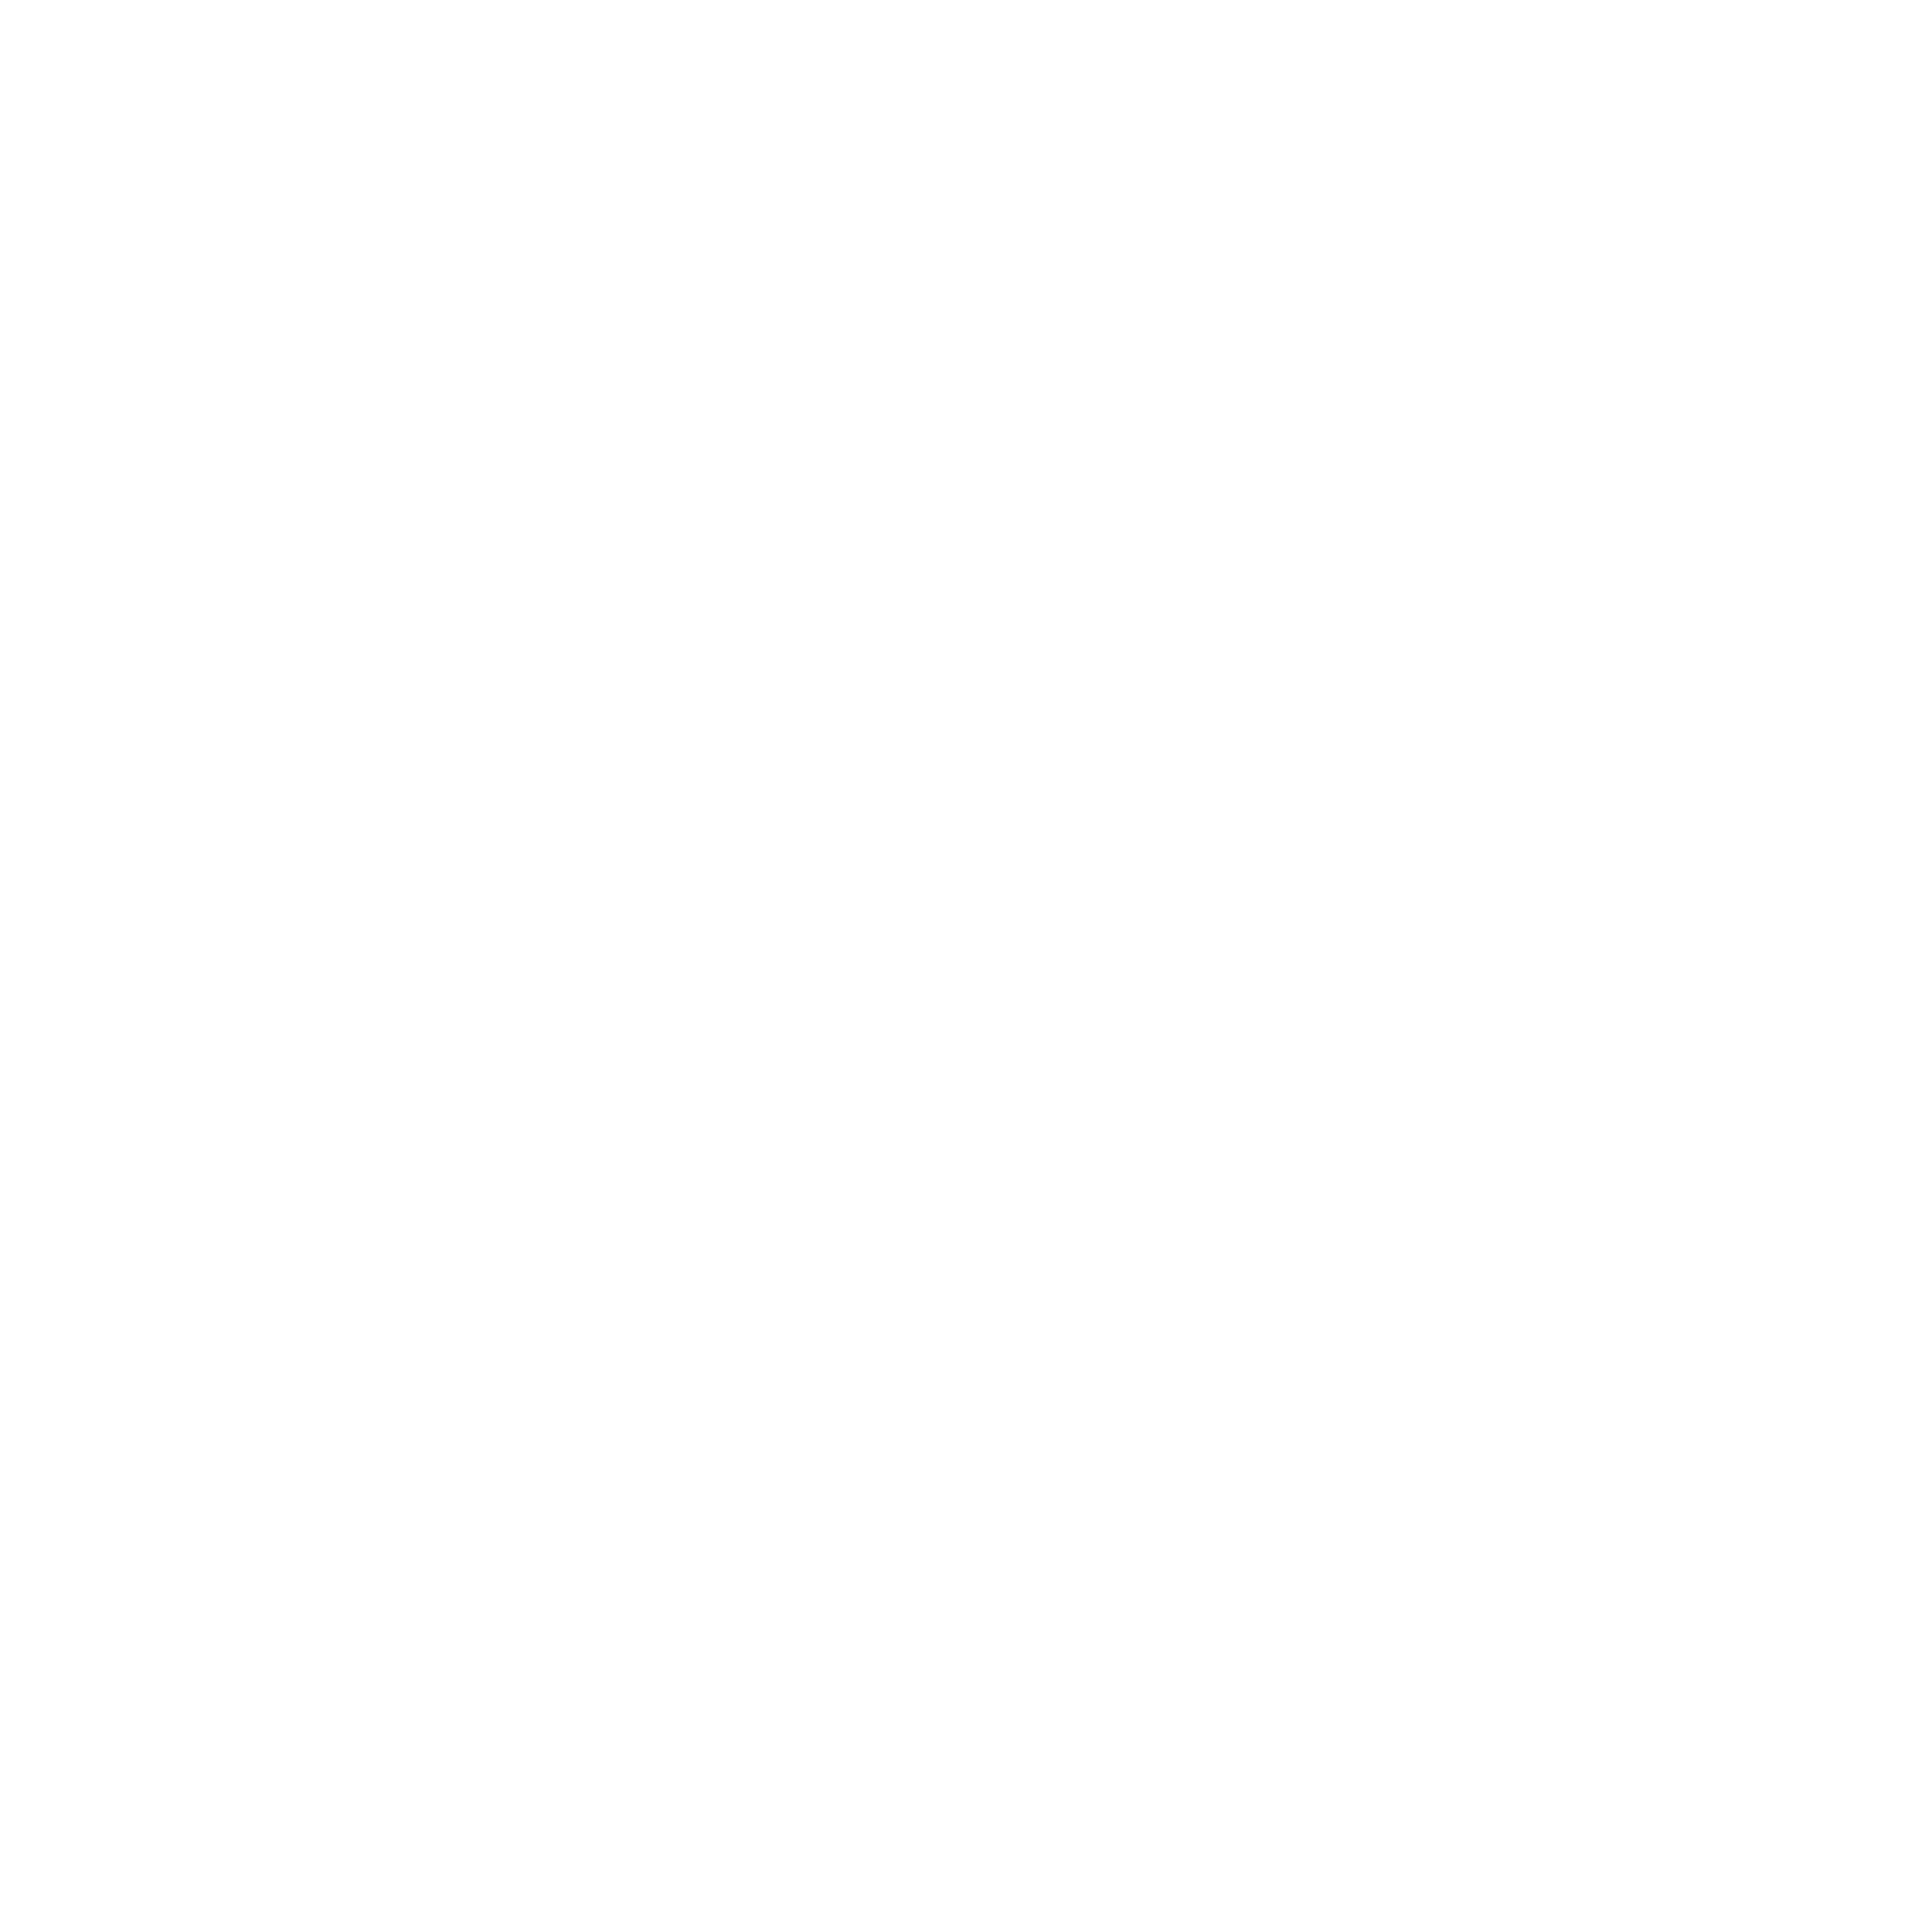 Marina Bay Financial Center MBFC